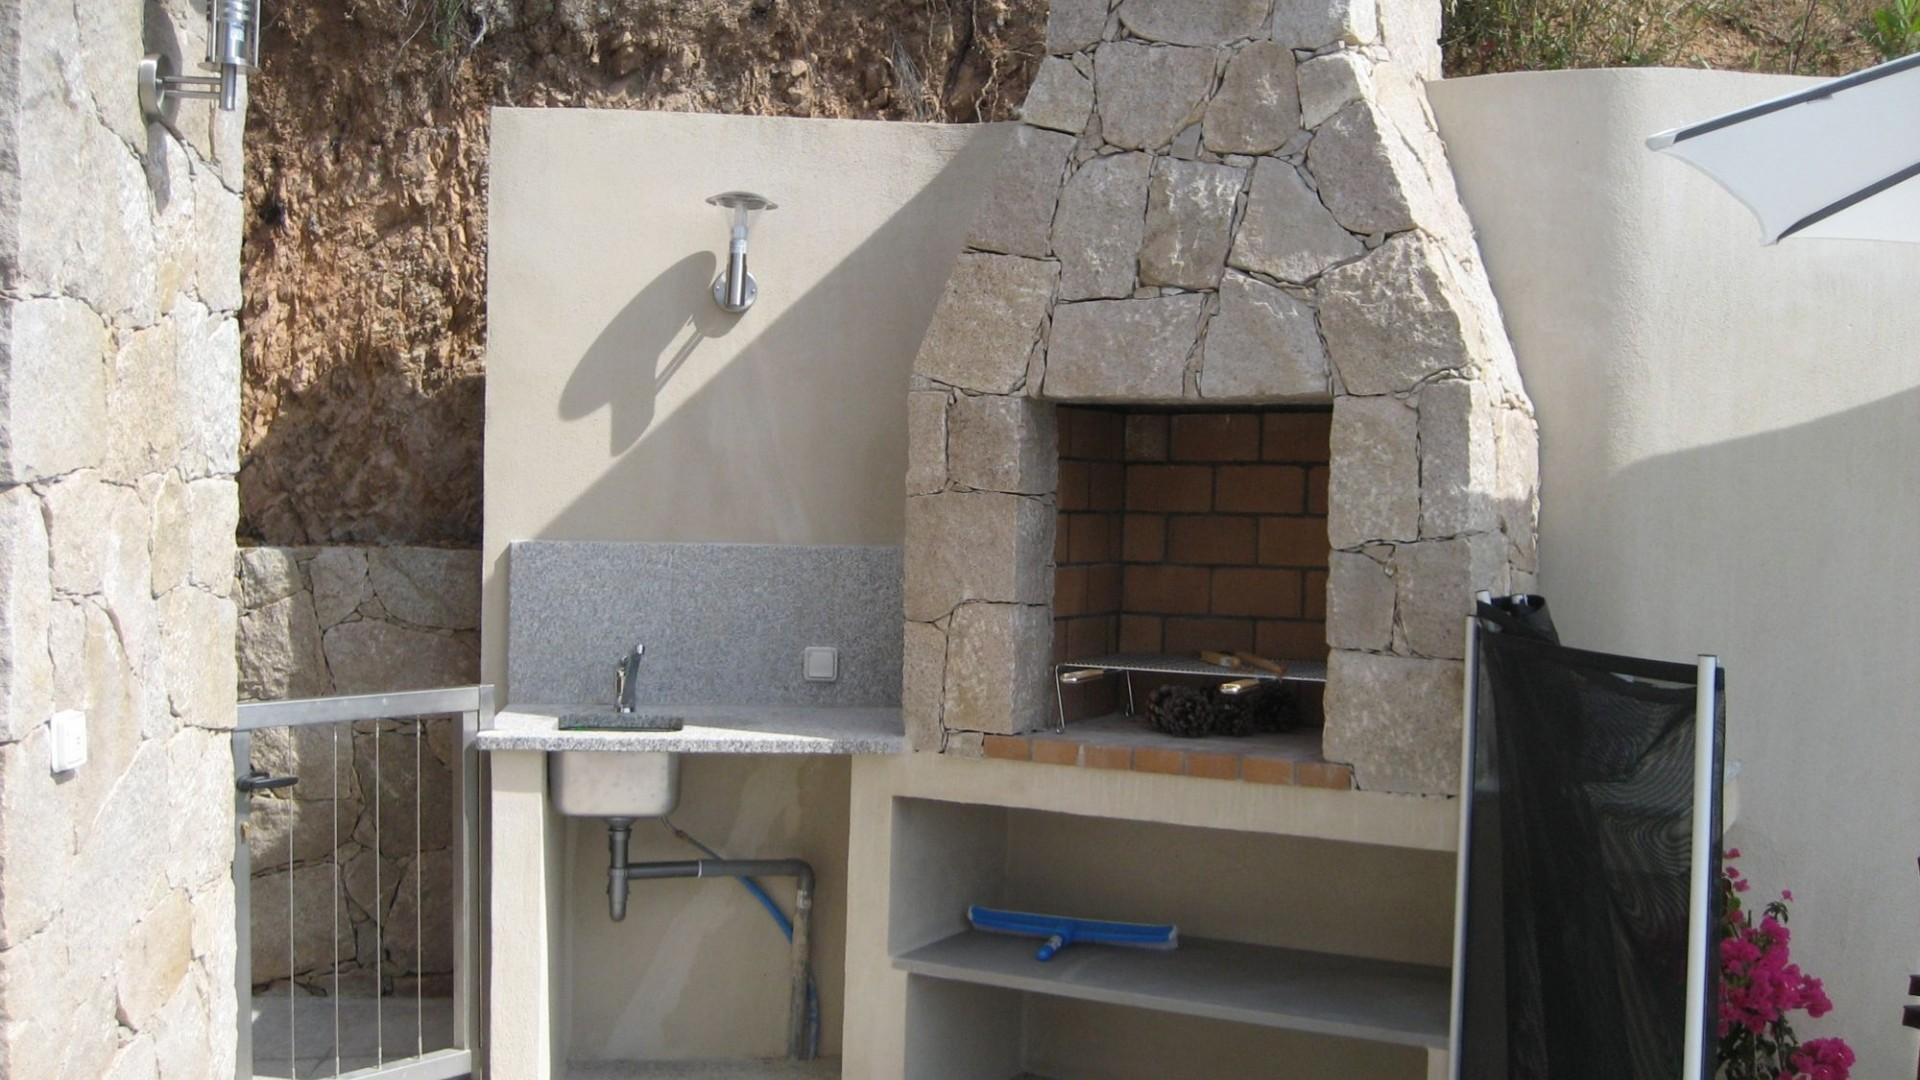 Korsika Ferienhaus mietent Barbecue